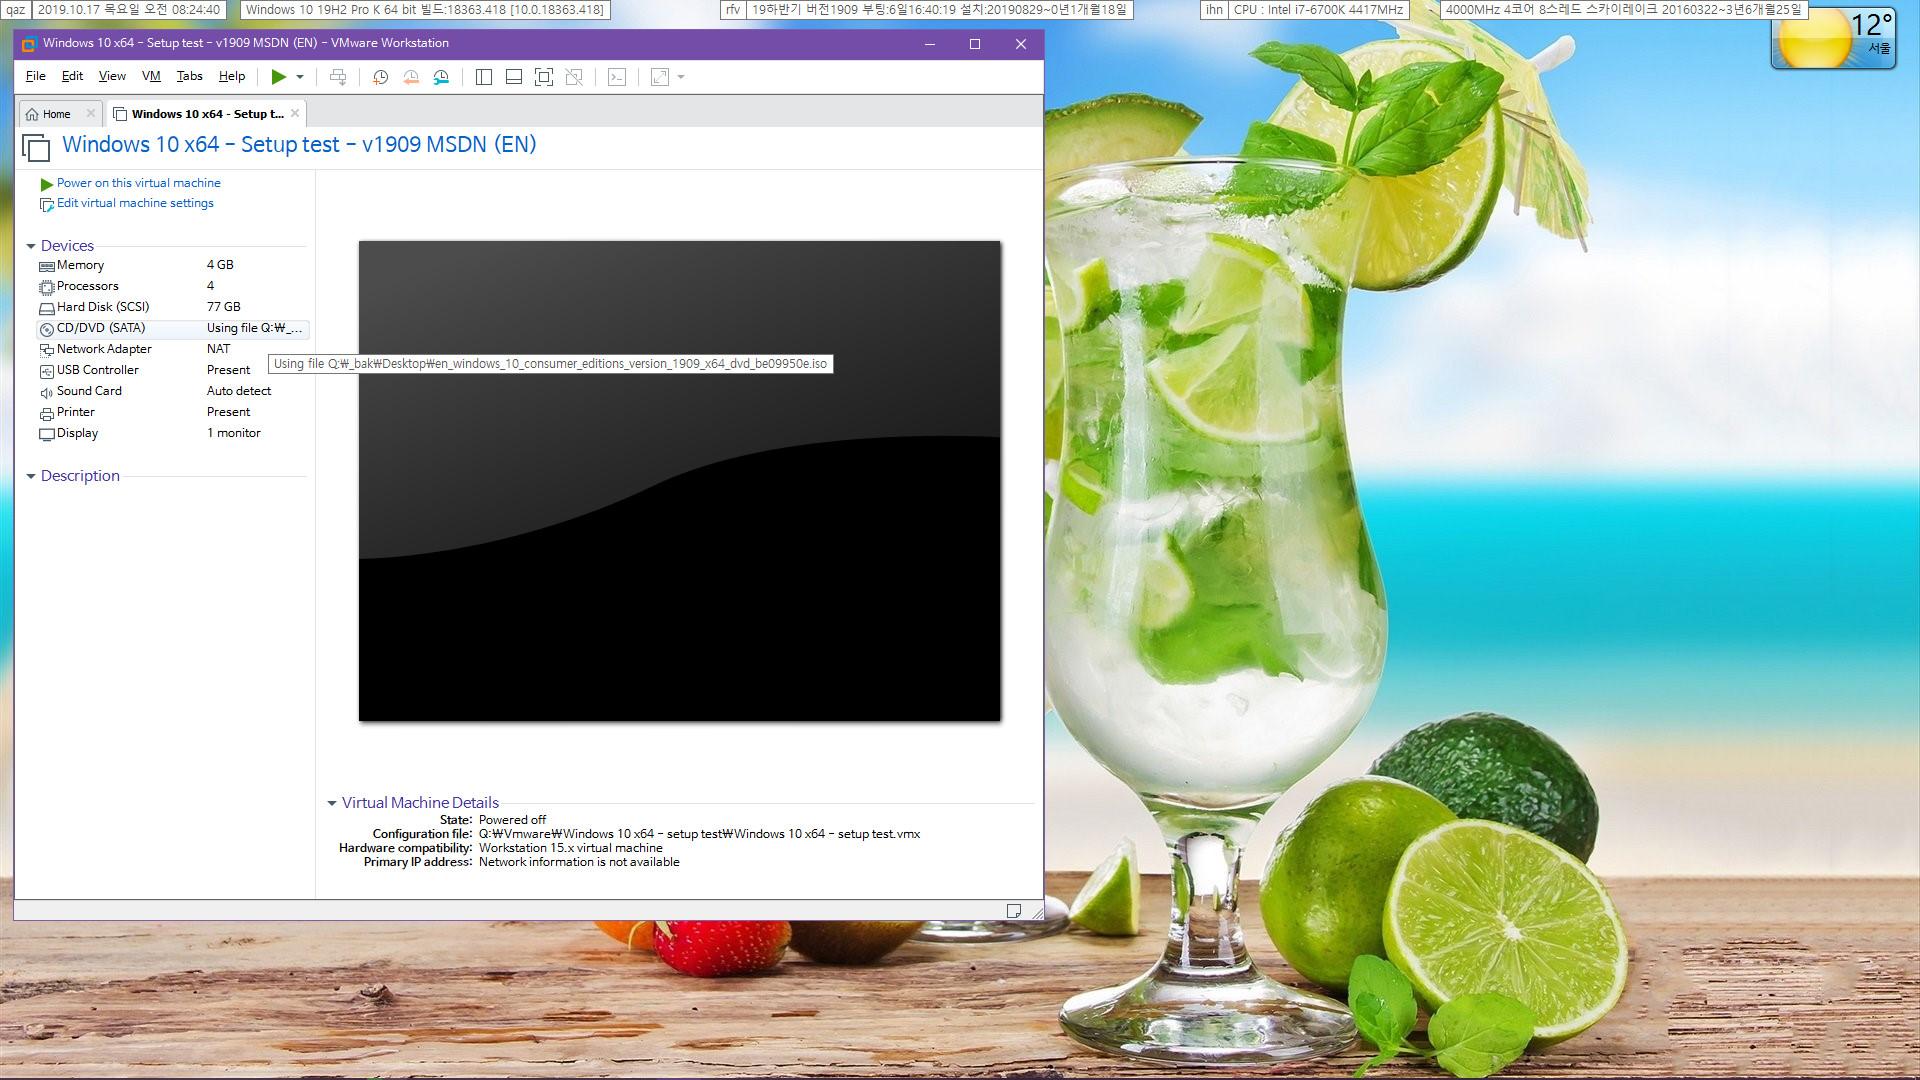 Windows 10 버전 1909 (OS빌드 18363.418) 코드네임 19H2 첫 MSDN 영문판 나왔네요 - 이미지 정보 - 여전히 버전 1903 의 업데이트 통합판에  KB4517245 추가 통합한 것 뿐입니다 - 설치 테스트 2019-10-17_082452.jpg